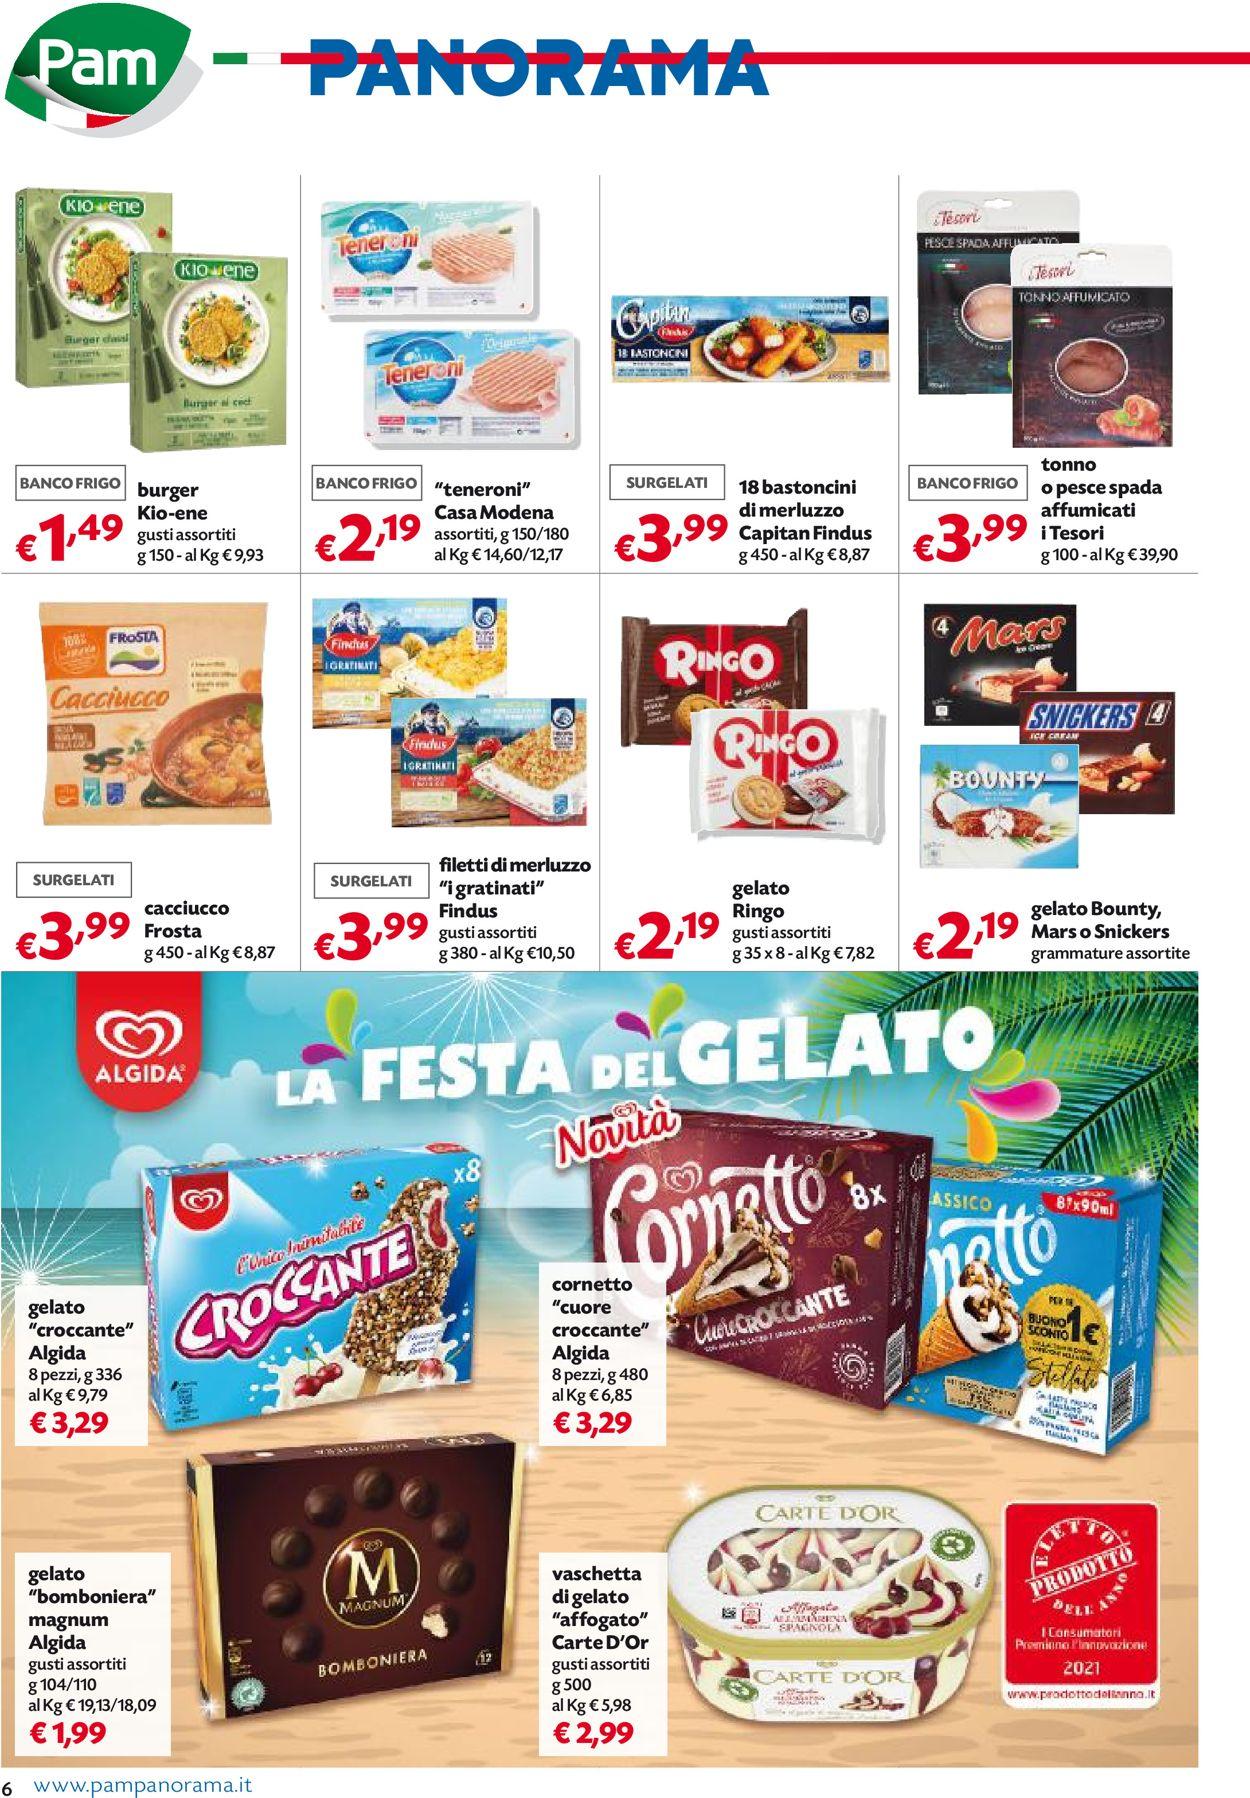 Volantino Pam Panorama - Offerte 17/06-30/06/2021 (Pagina 6)